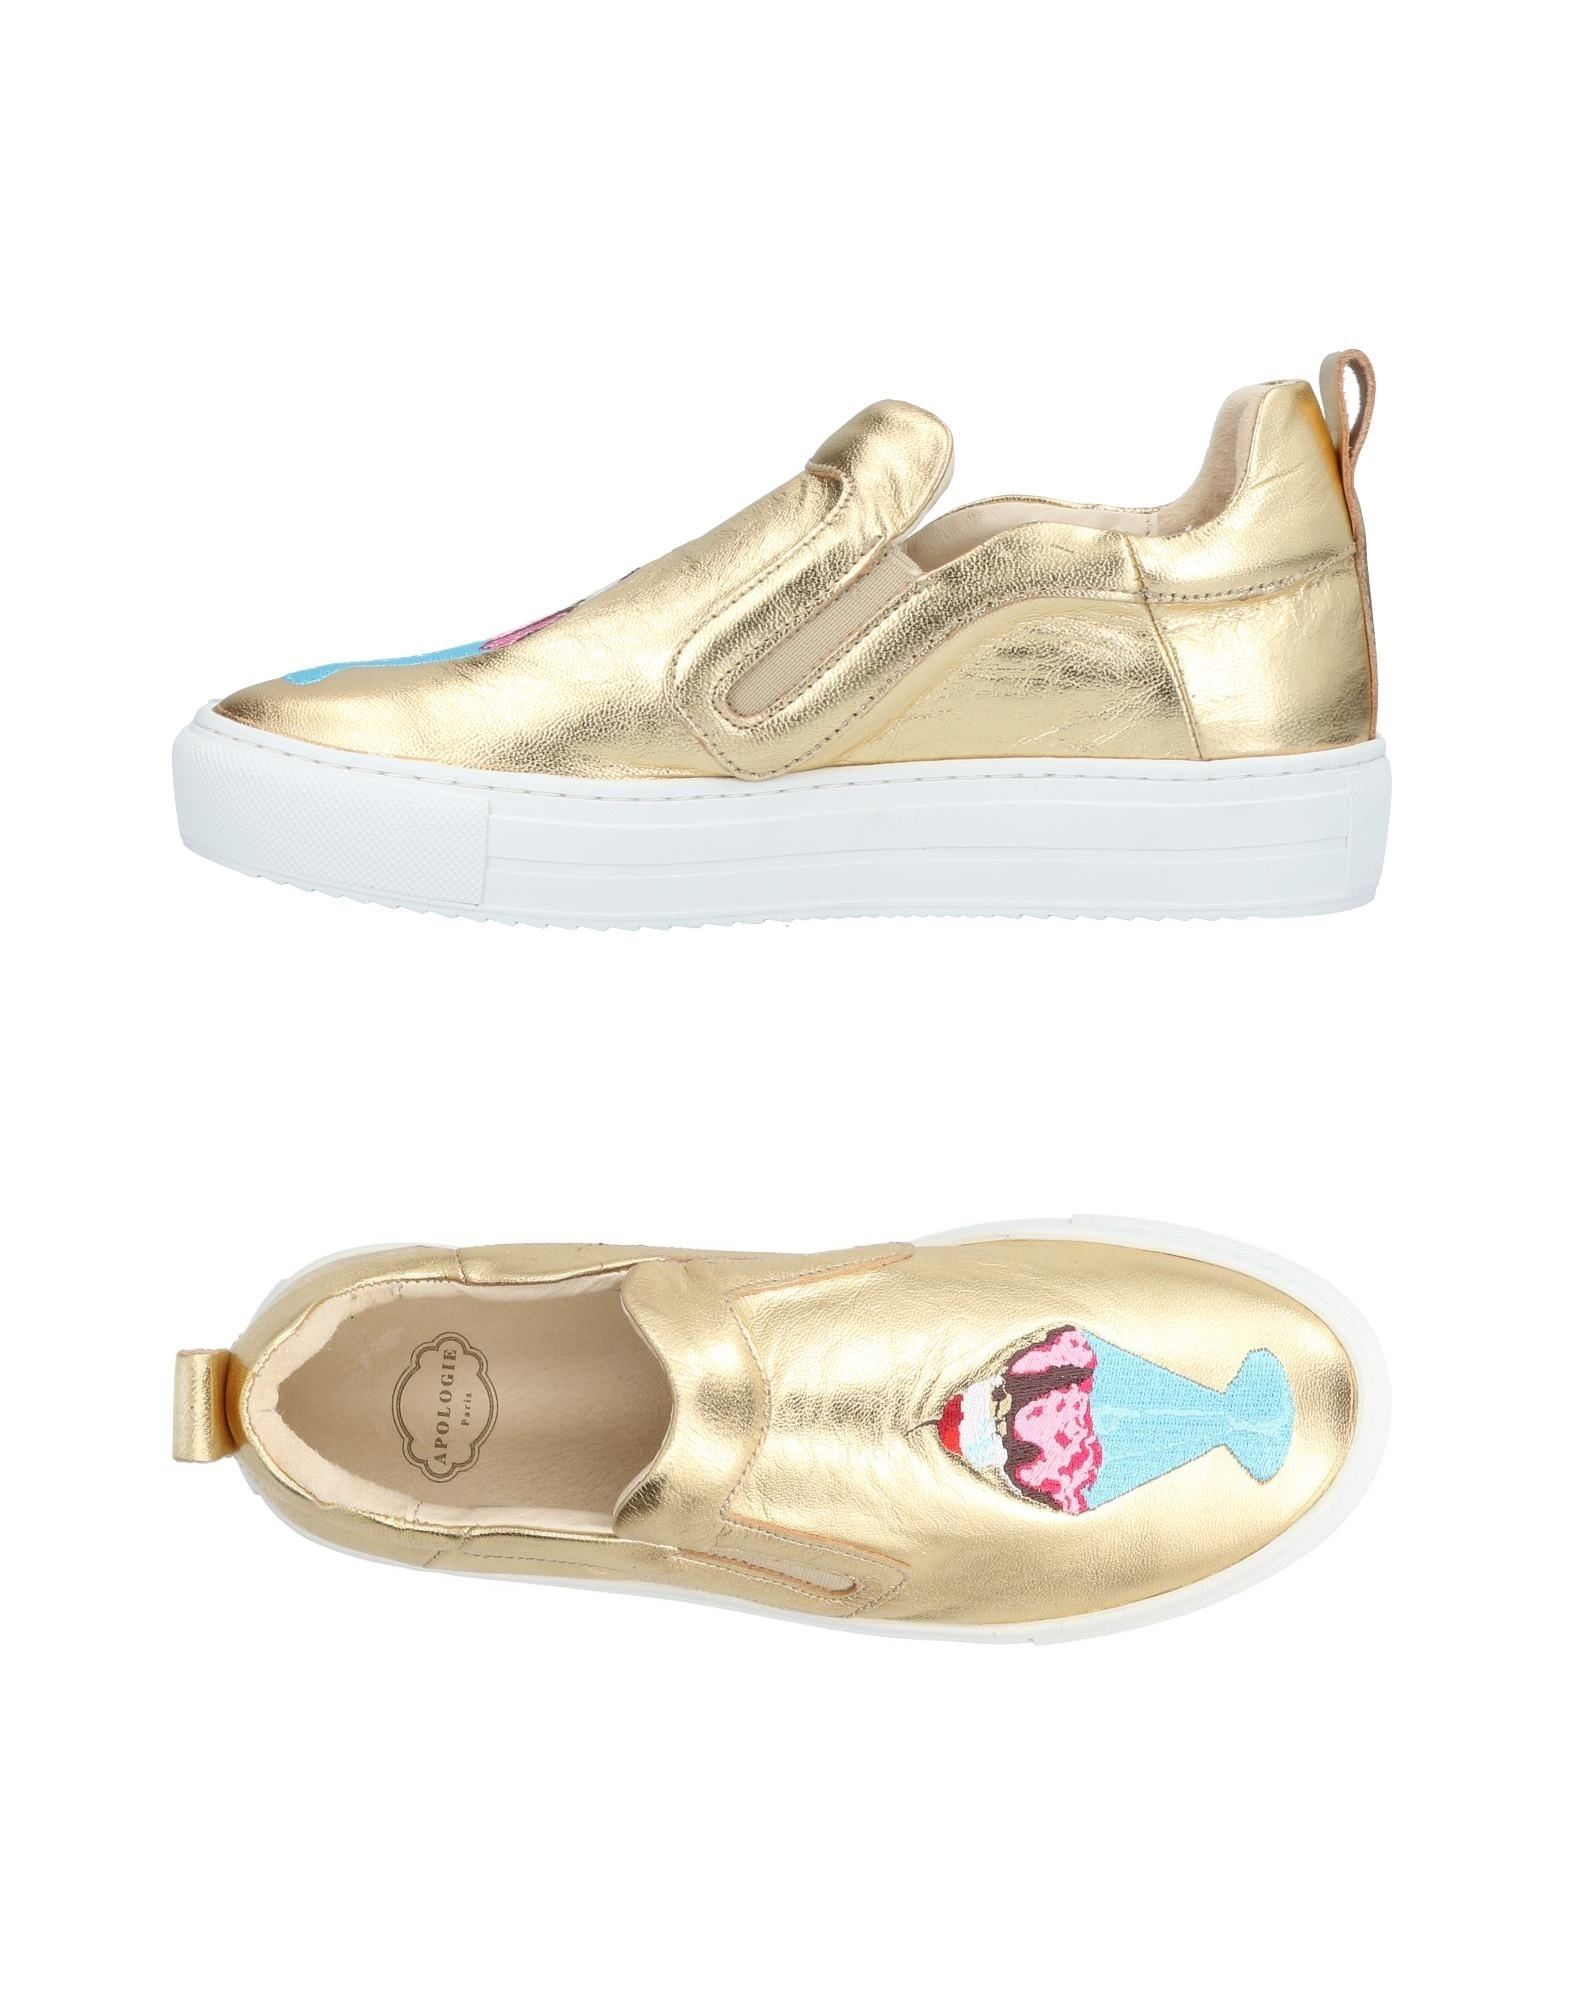 Apologie Sneakers Damen  11431519DT Gute Qualität beliebte Schuhe